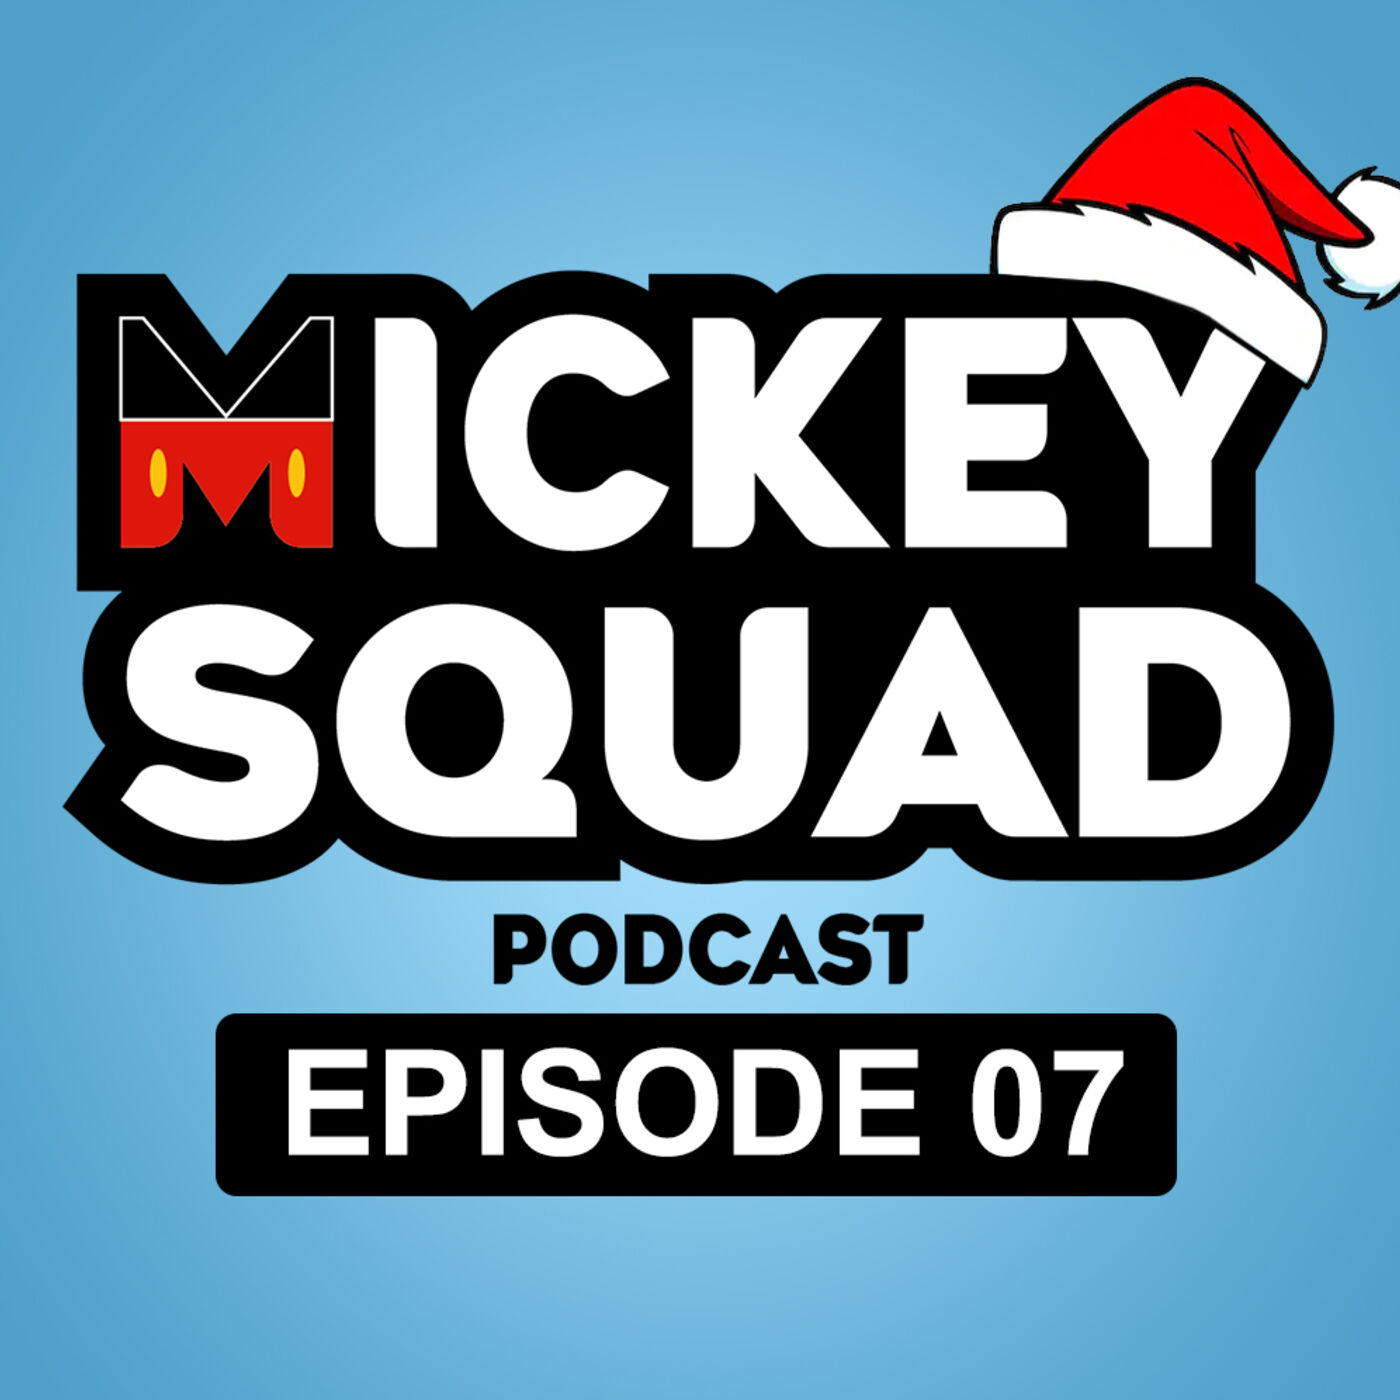 Episode 07 - We Wish Queue A Merry Christmas